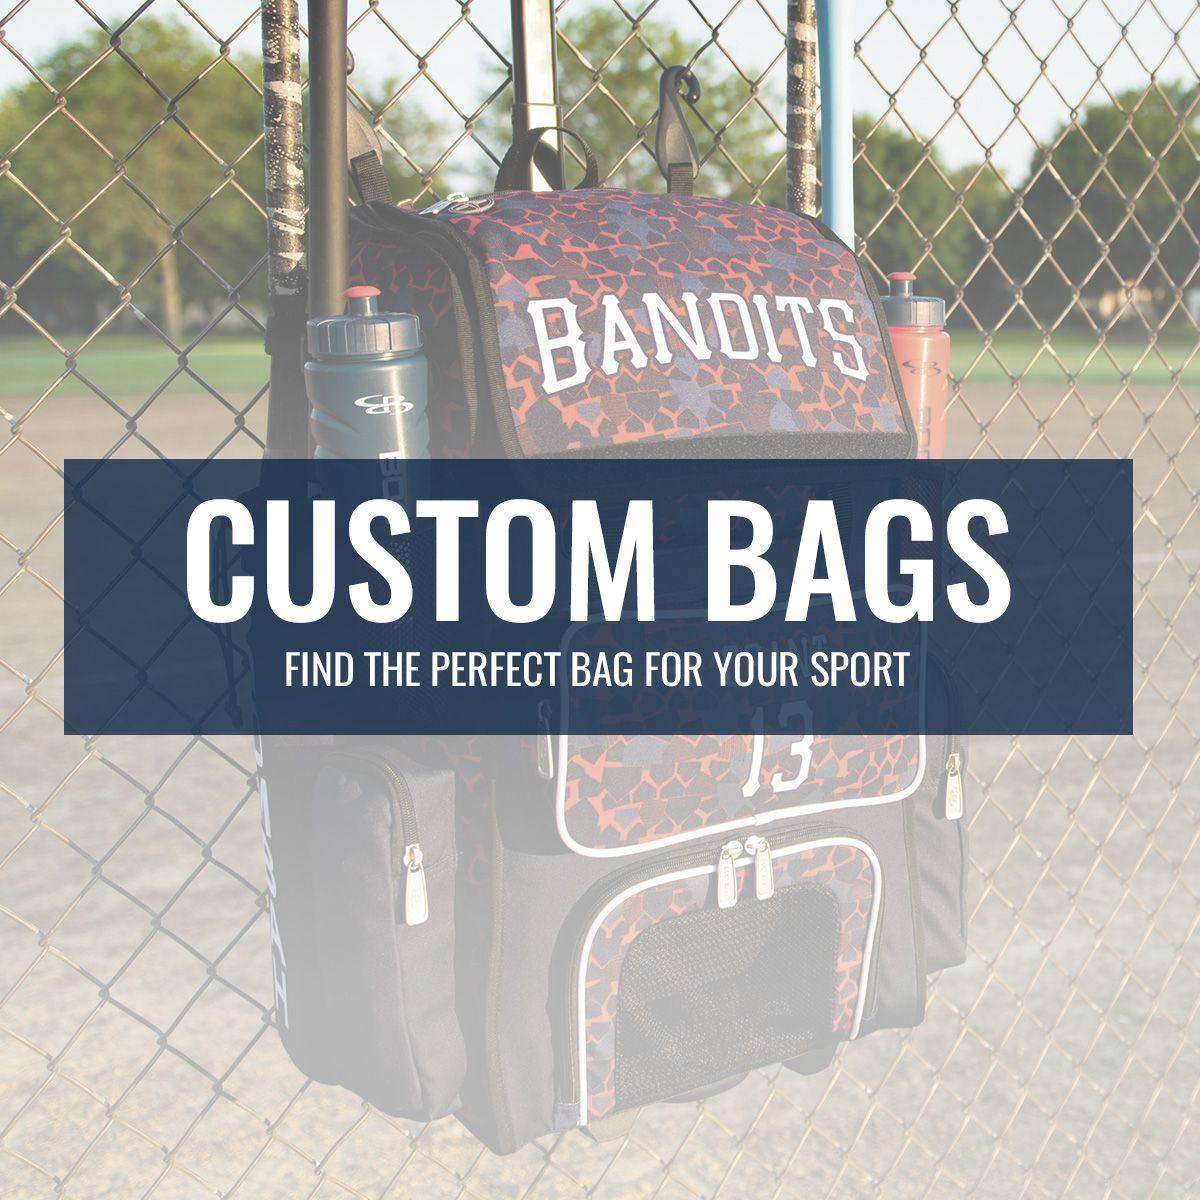 Find The Perfect Custom Bag For Your Sport Boombah Boombahgear Batbag Batpack Softball Slo Custom Bags Usa Baseball Volleyball Gear